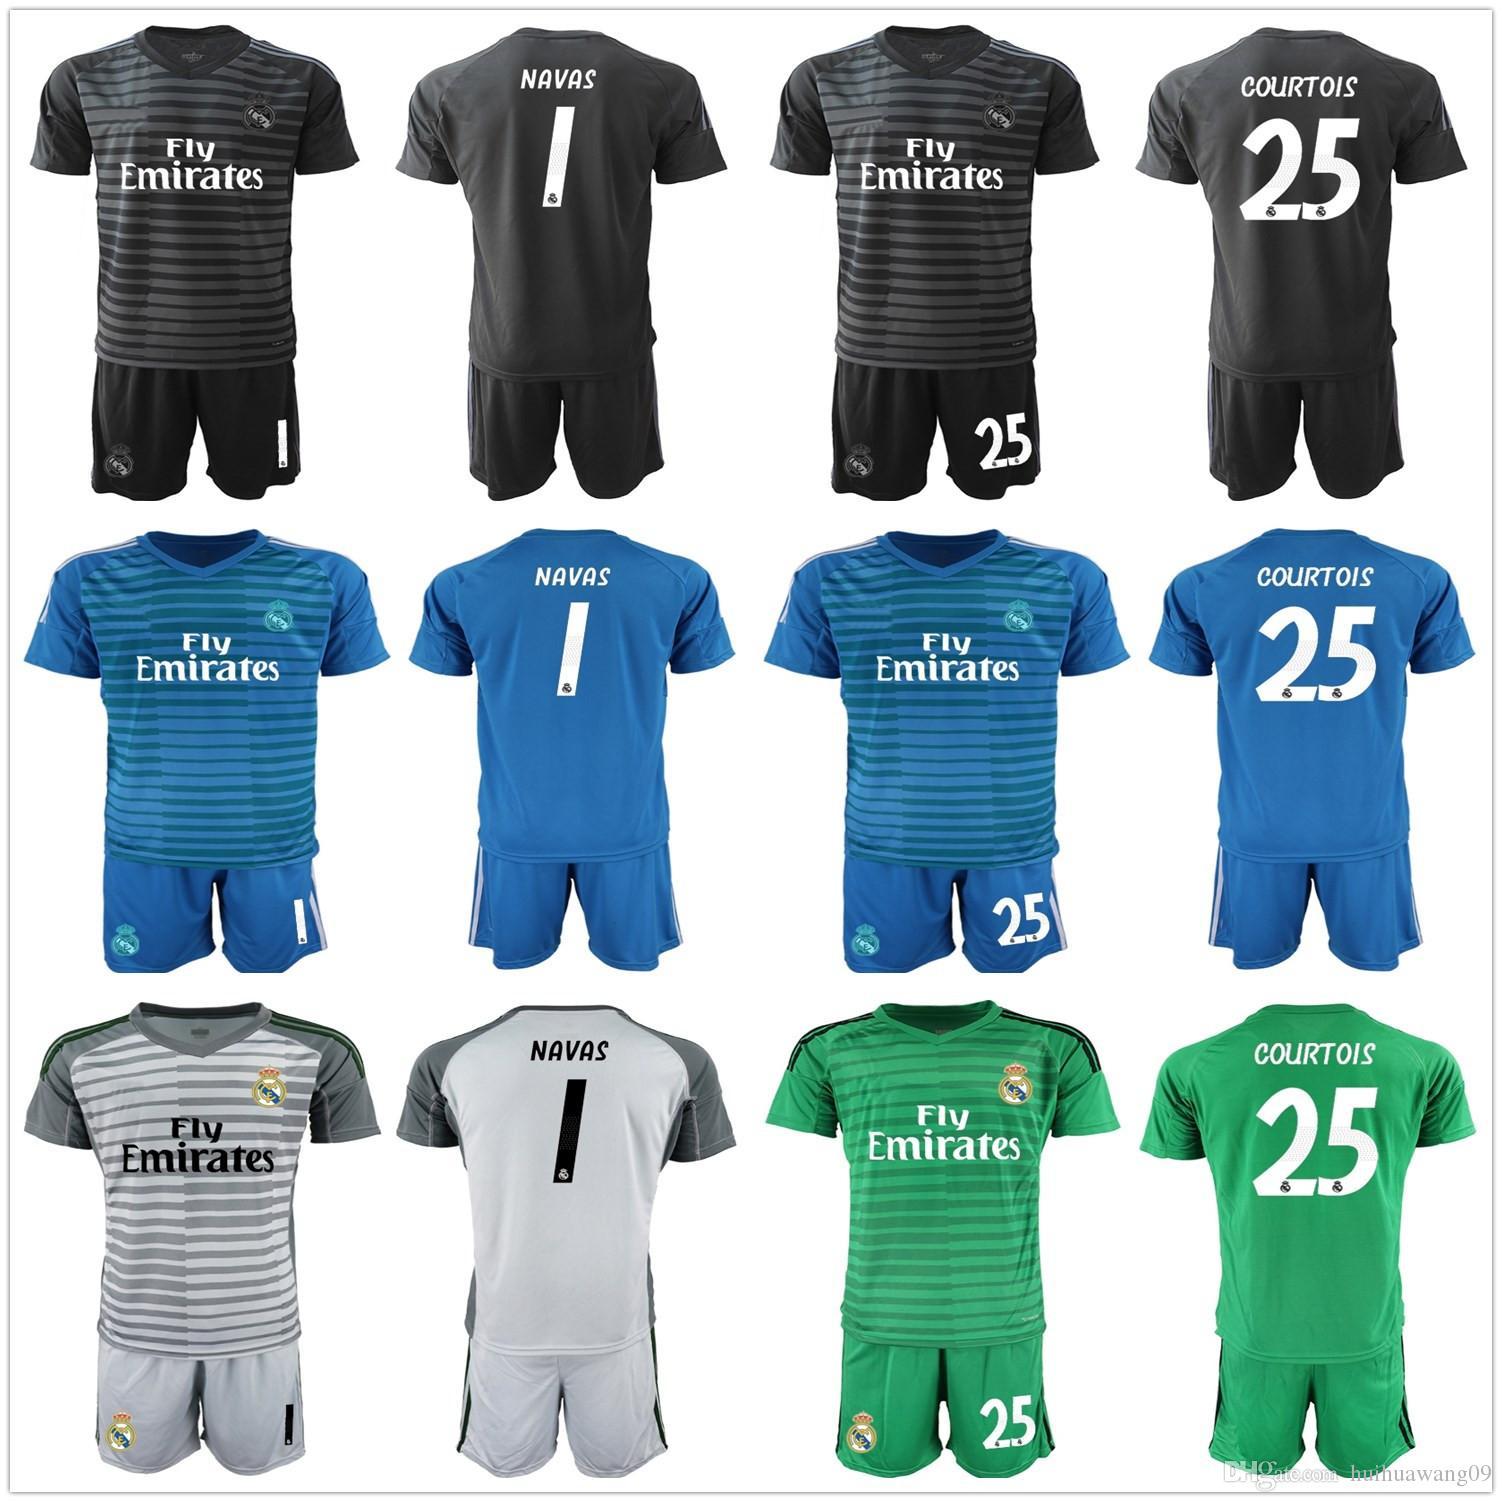 2018 2019 Adults Keylor NAVAS 25 Courtois Real Madrid Soccer Sets  Goalkeeper Jersey Kit Men Benzema Bale Goalie Blue Black Football Uniform  UK 2019 From ... a615e35f2fe44